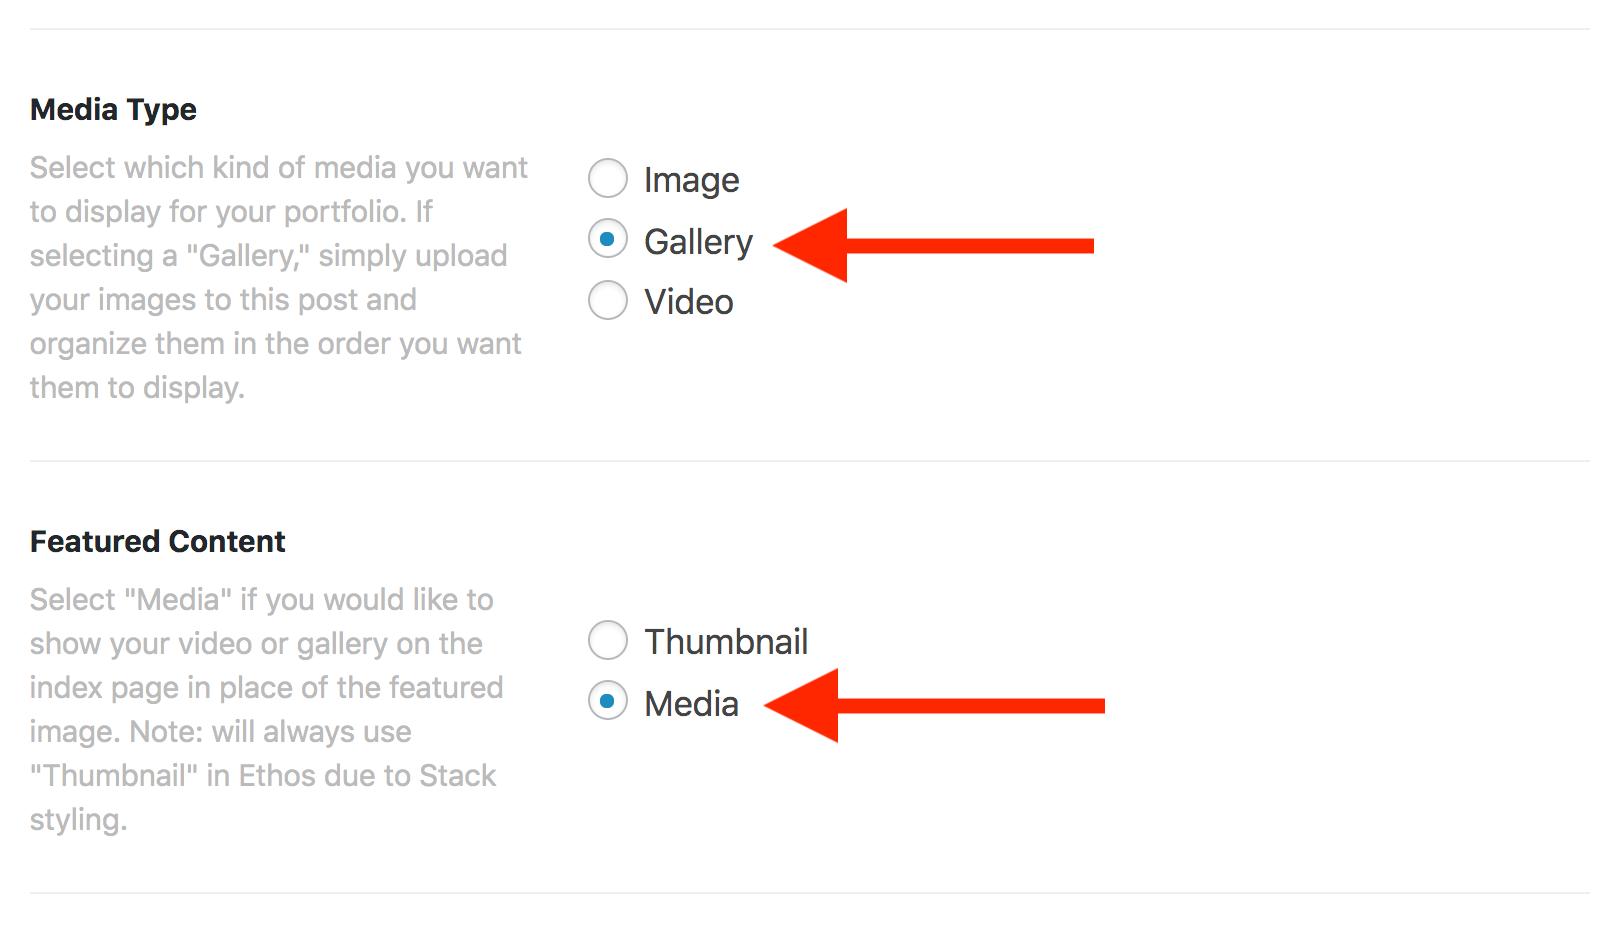 Gallery Media Type